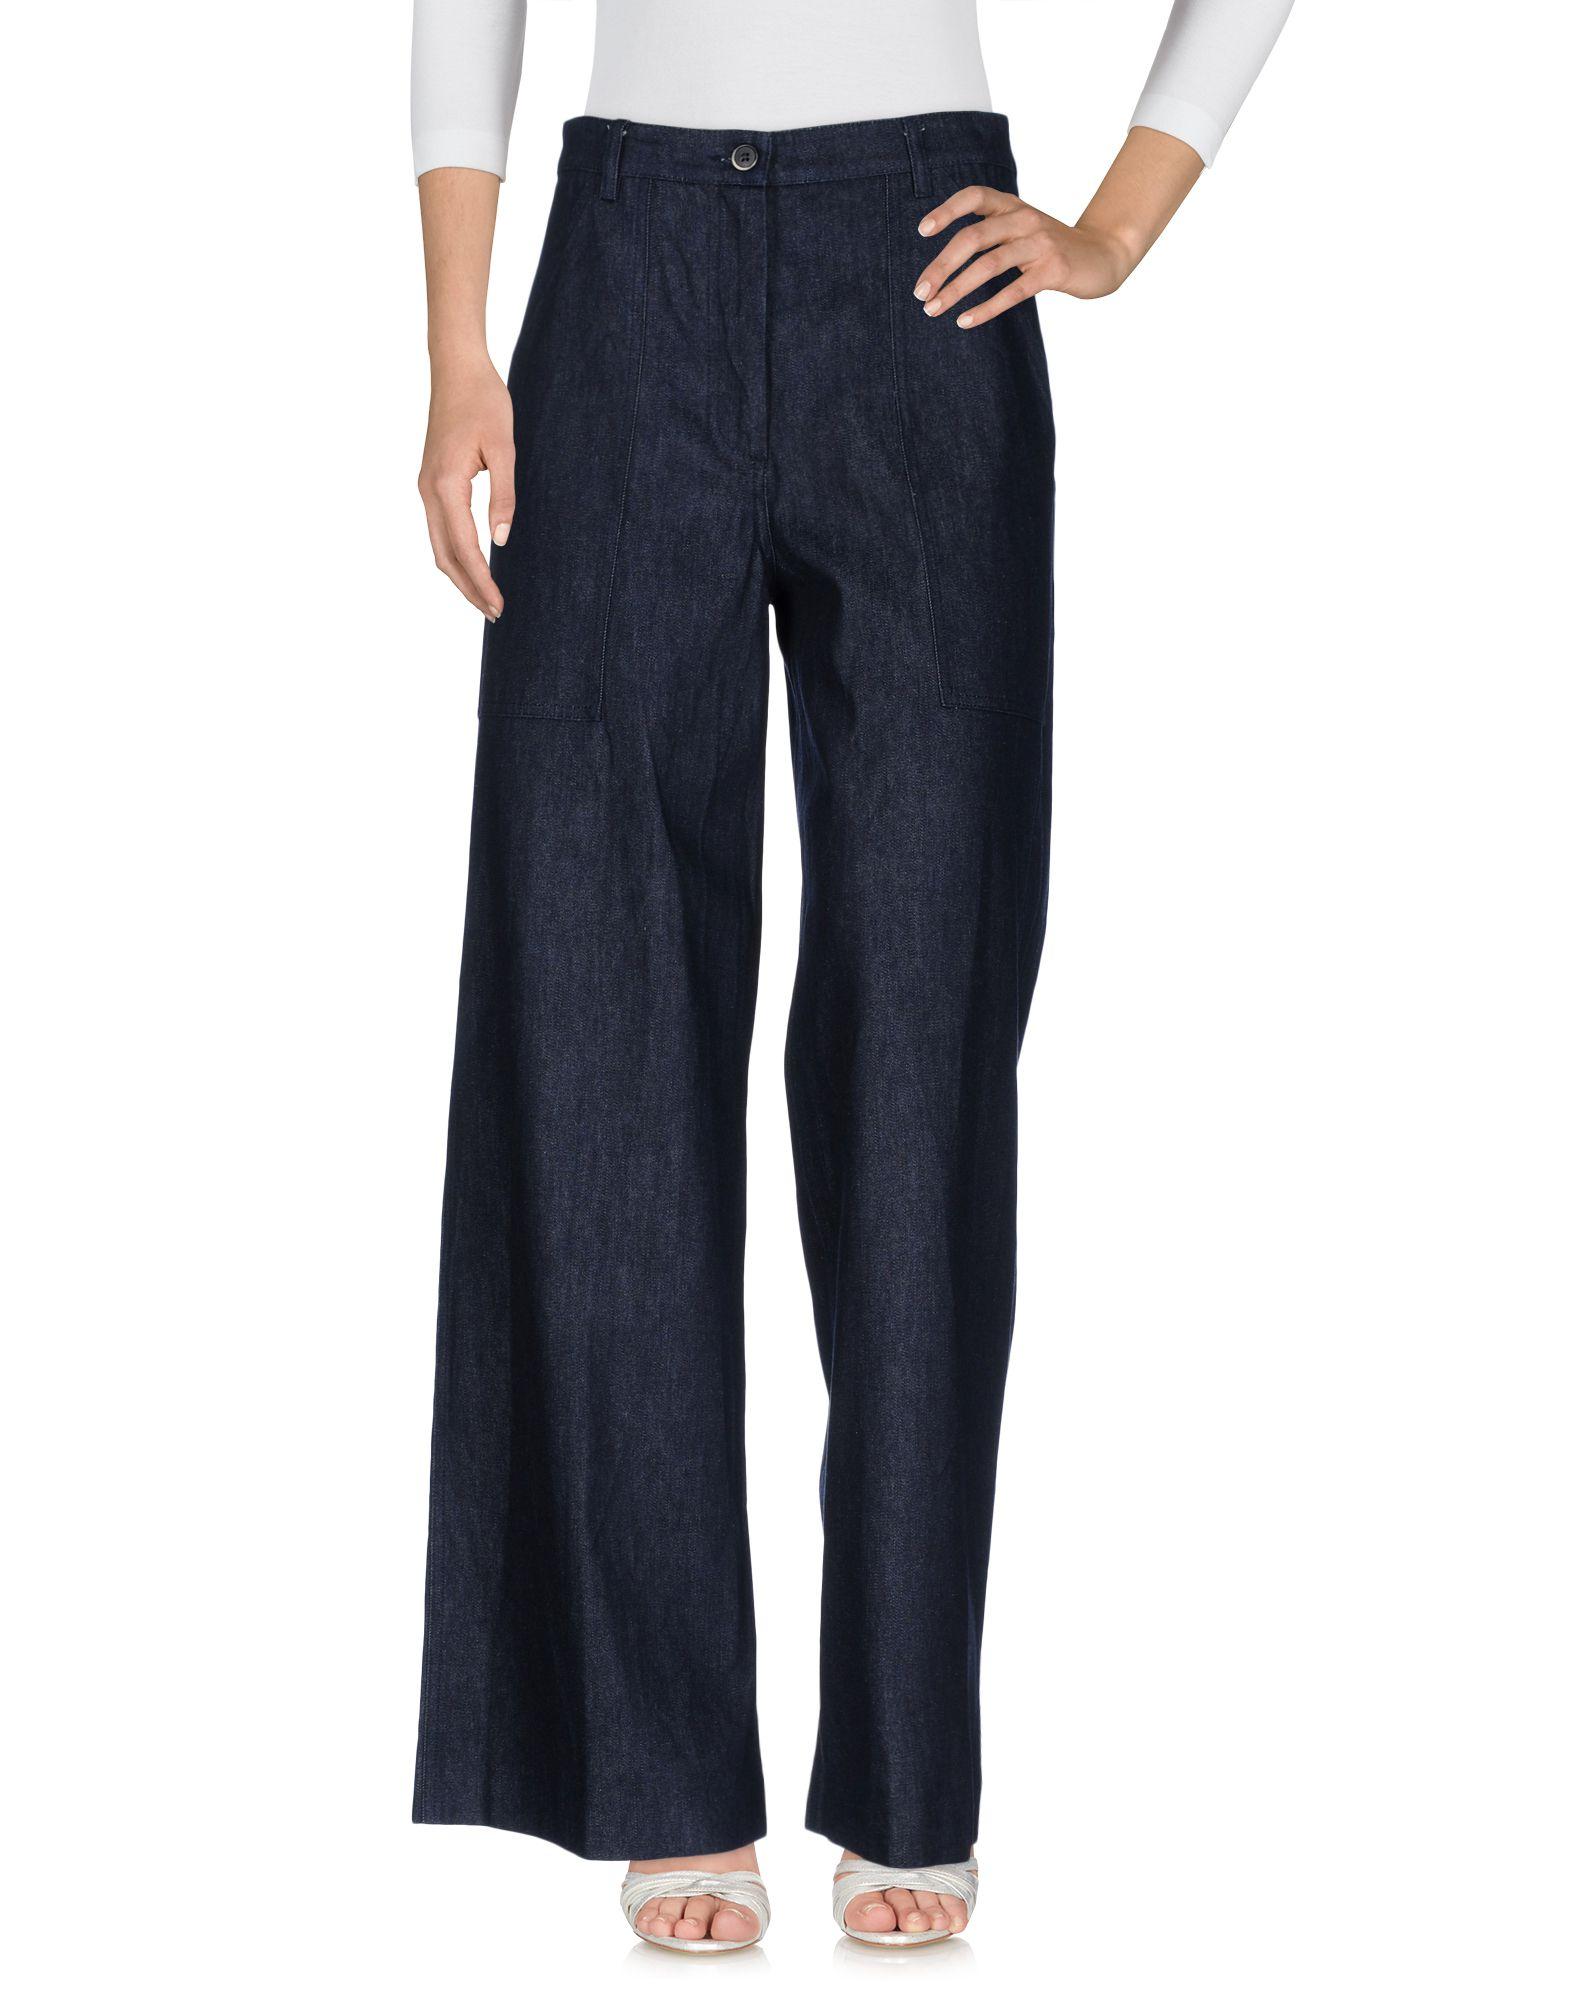 Pantaloni Jeans Barena Donna - Acquista online su rYppZmKts